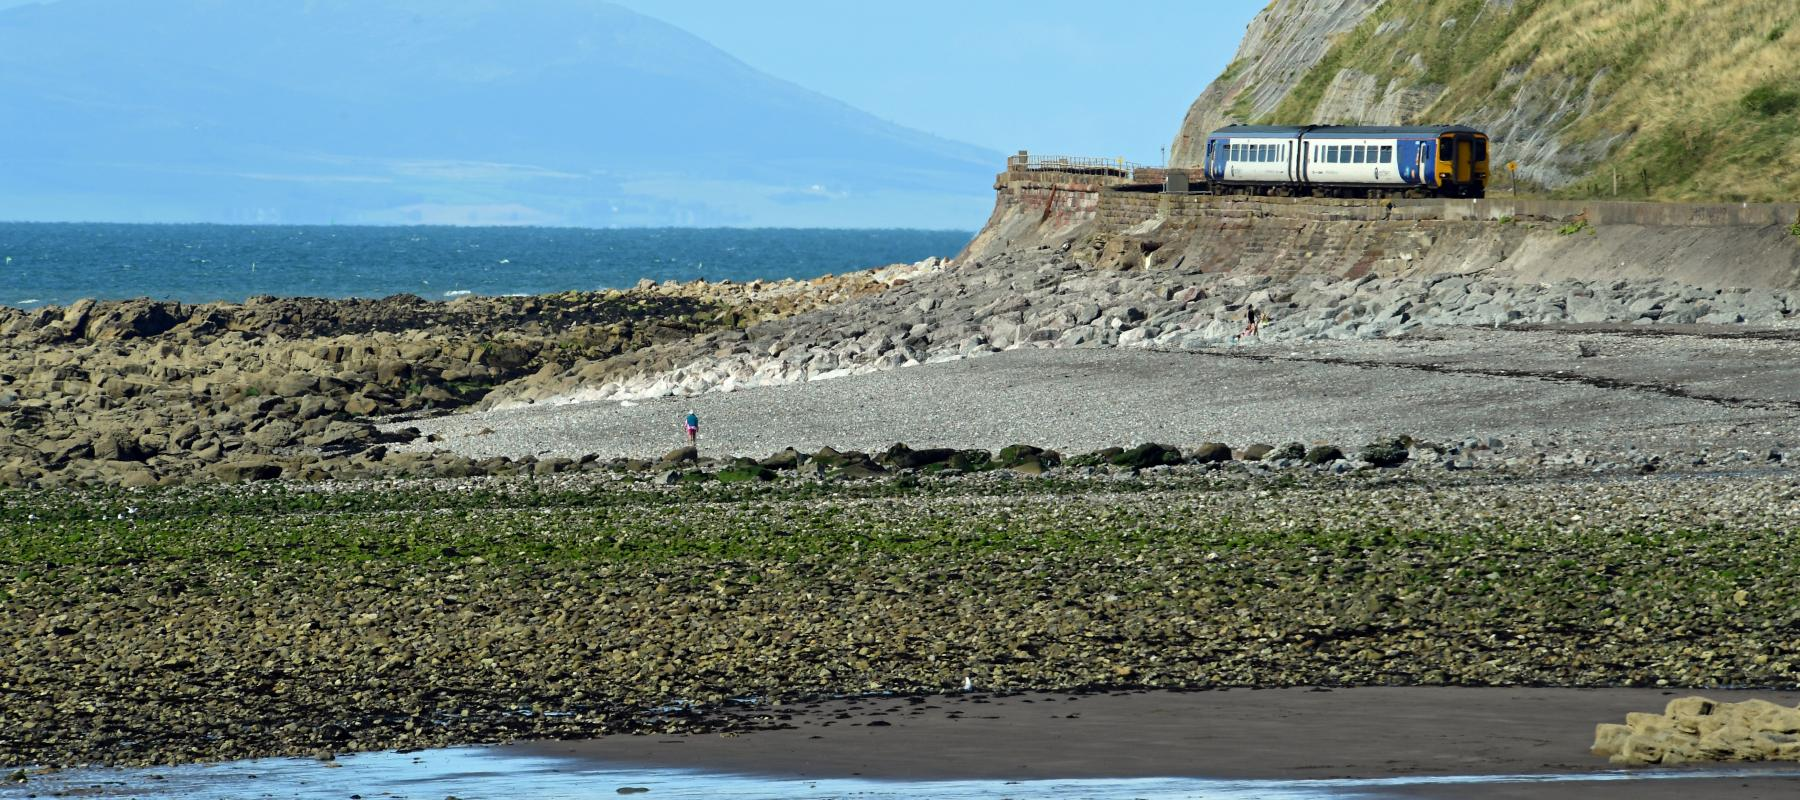 Days ou by rail along the Cumbrian Coast Line